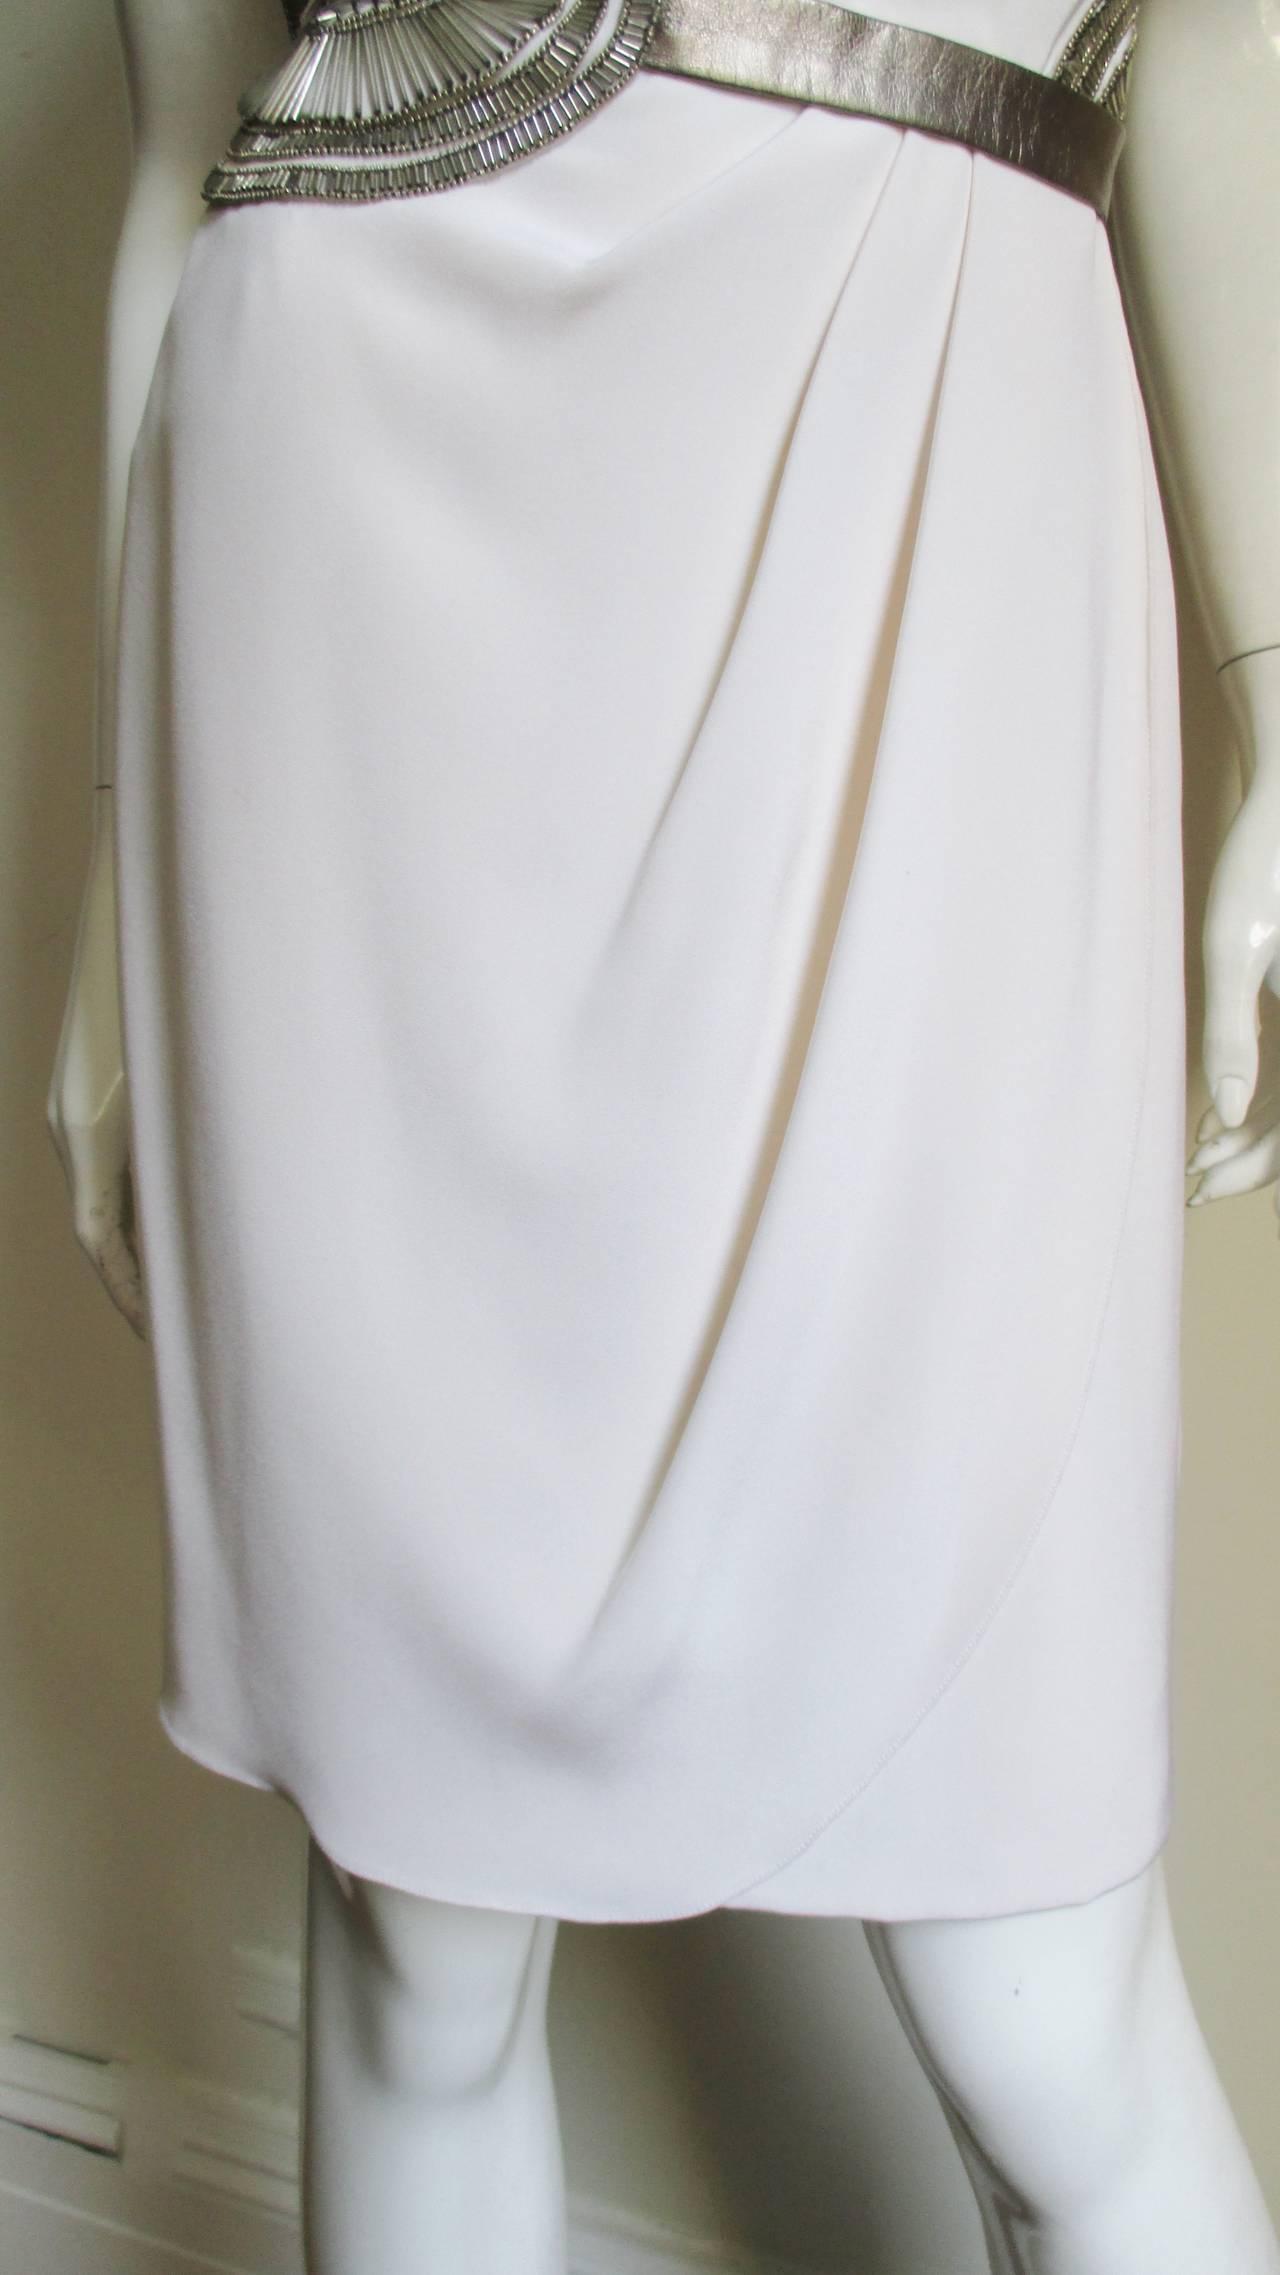 1990s Bill Blass Silk Dress With Elaborate Beading 5